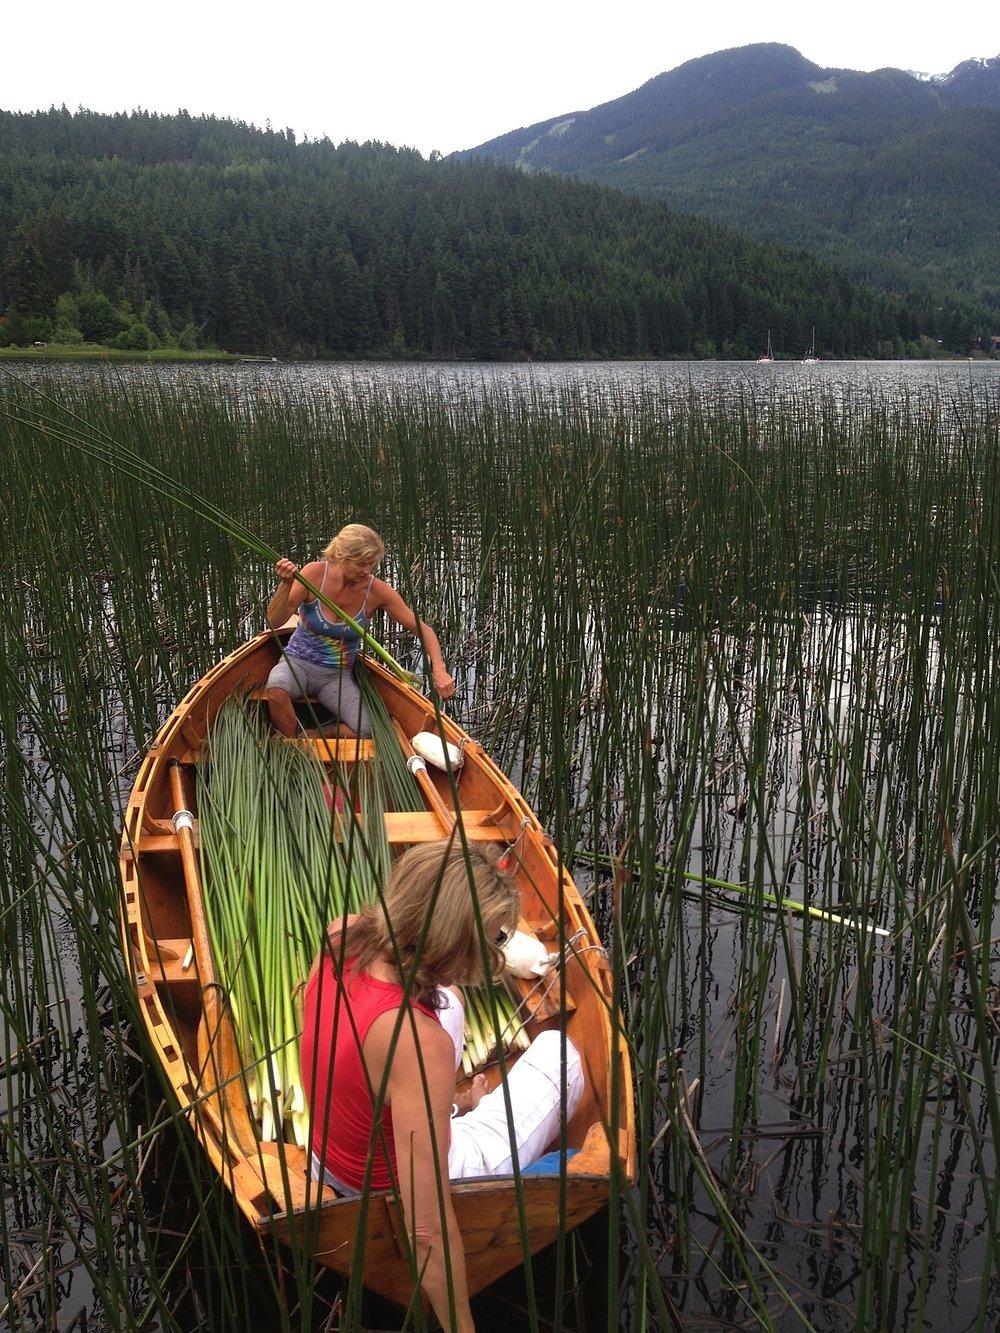 Harvesting Tule Rush reeds